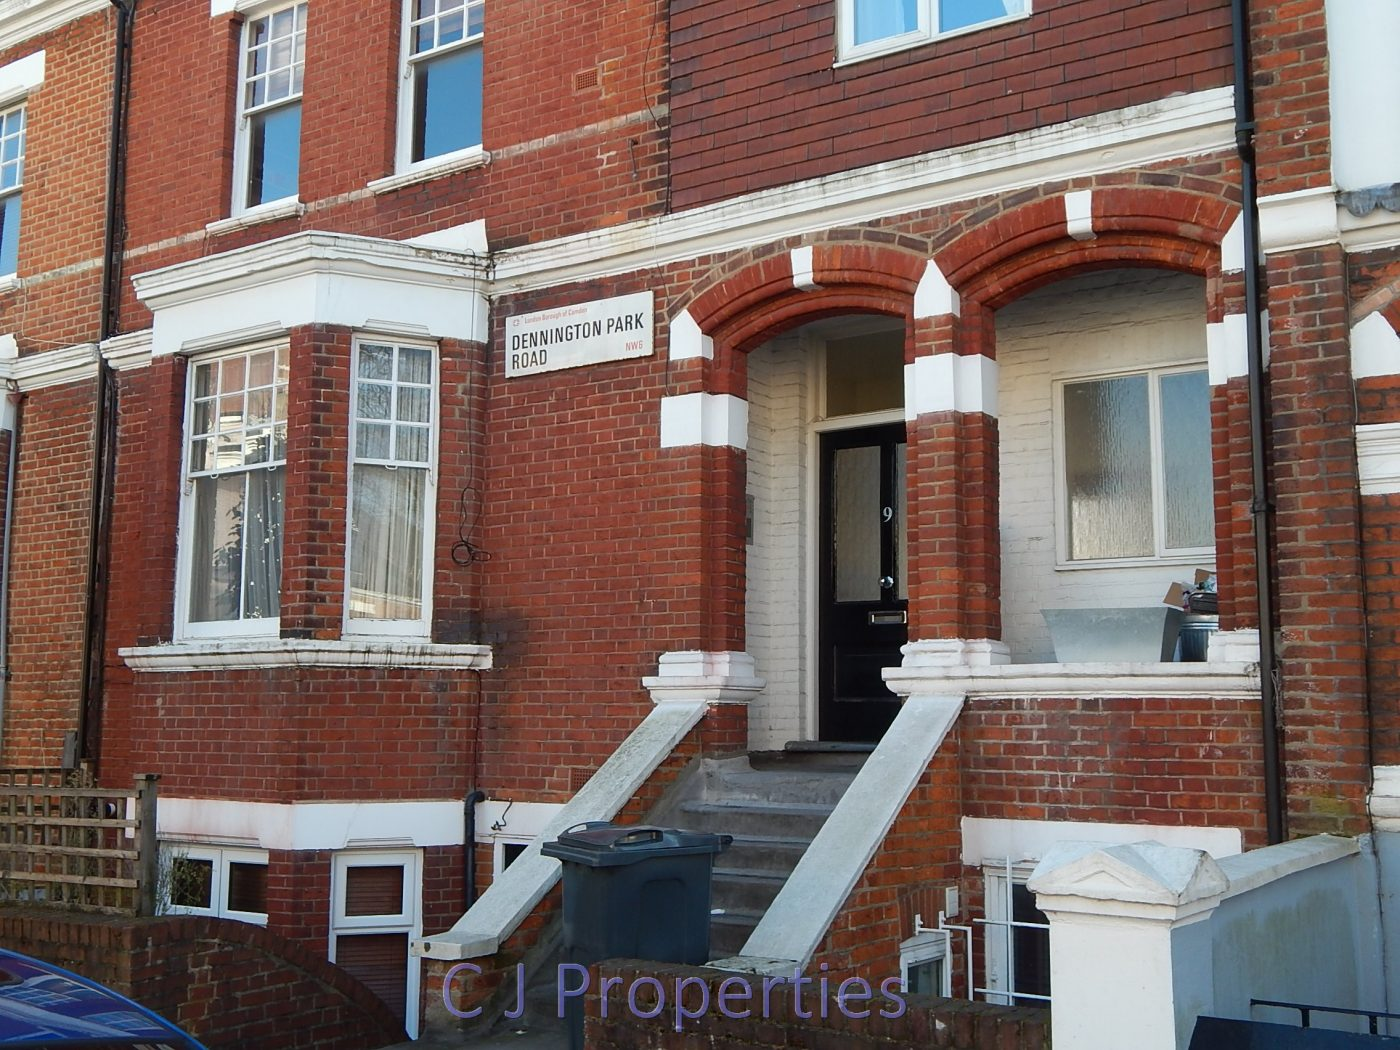 Dennington Park Road, West Hampstead, NW6